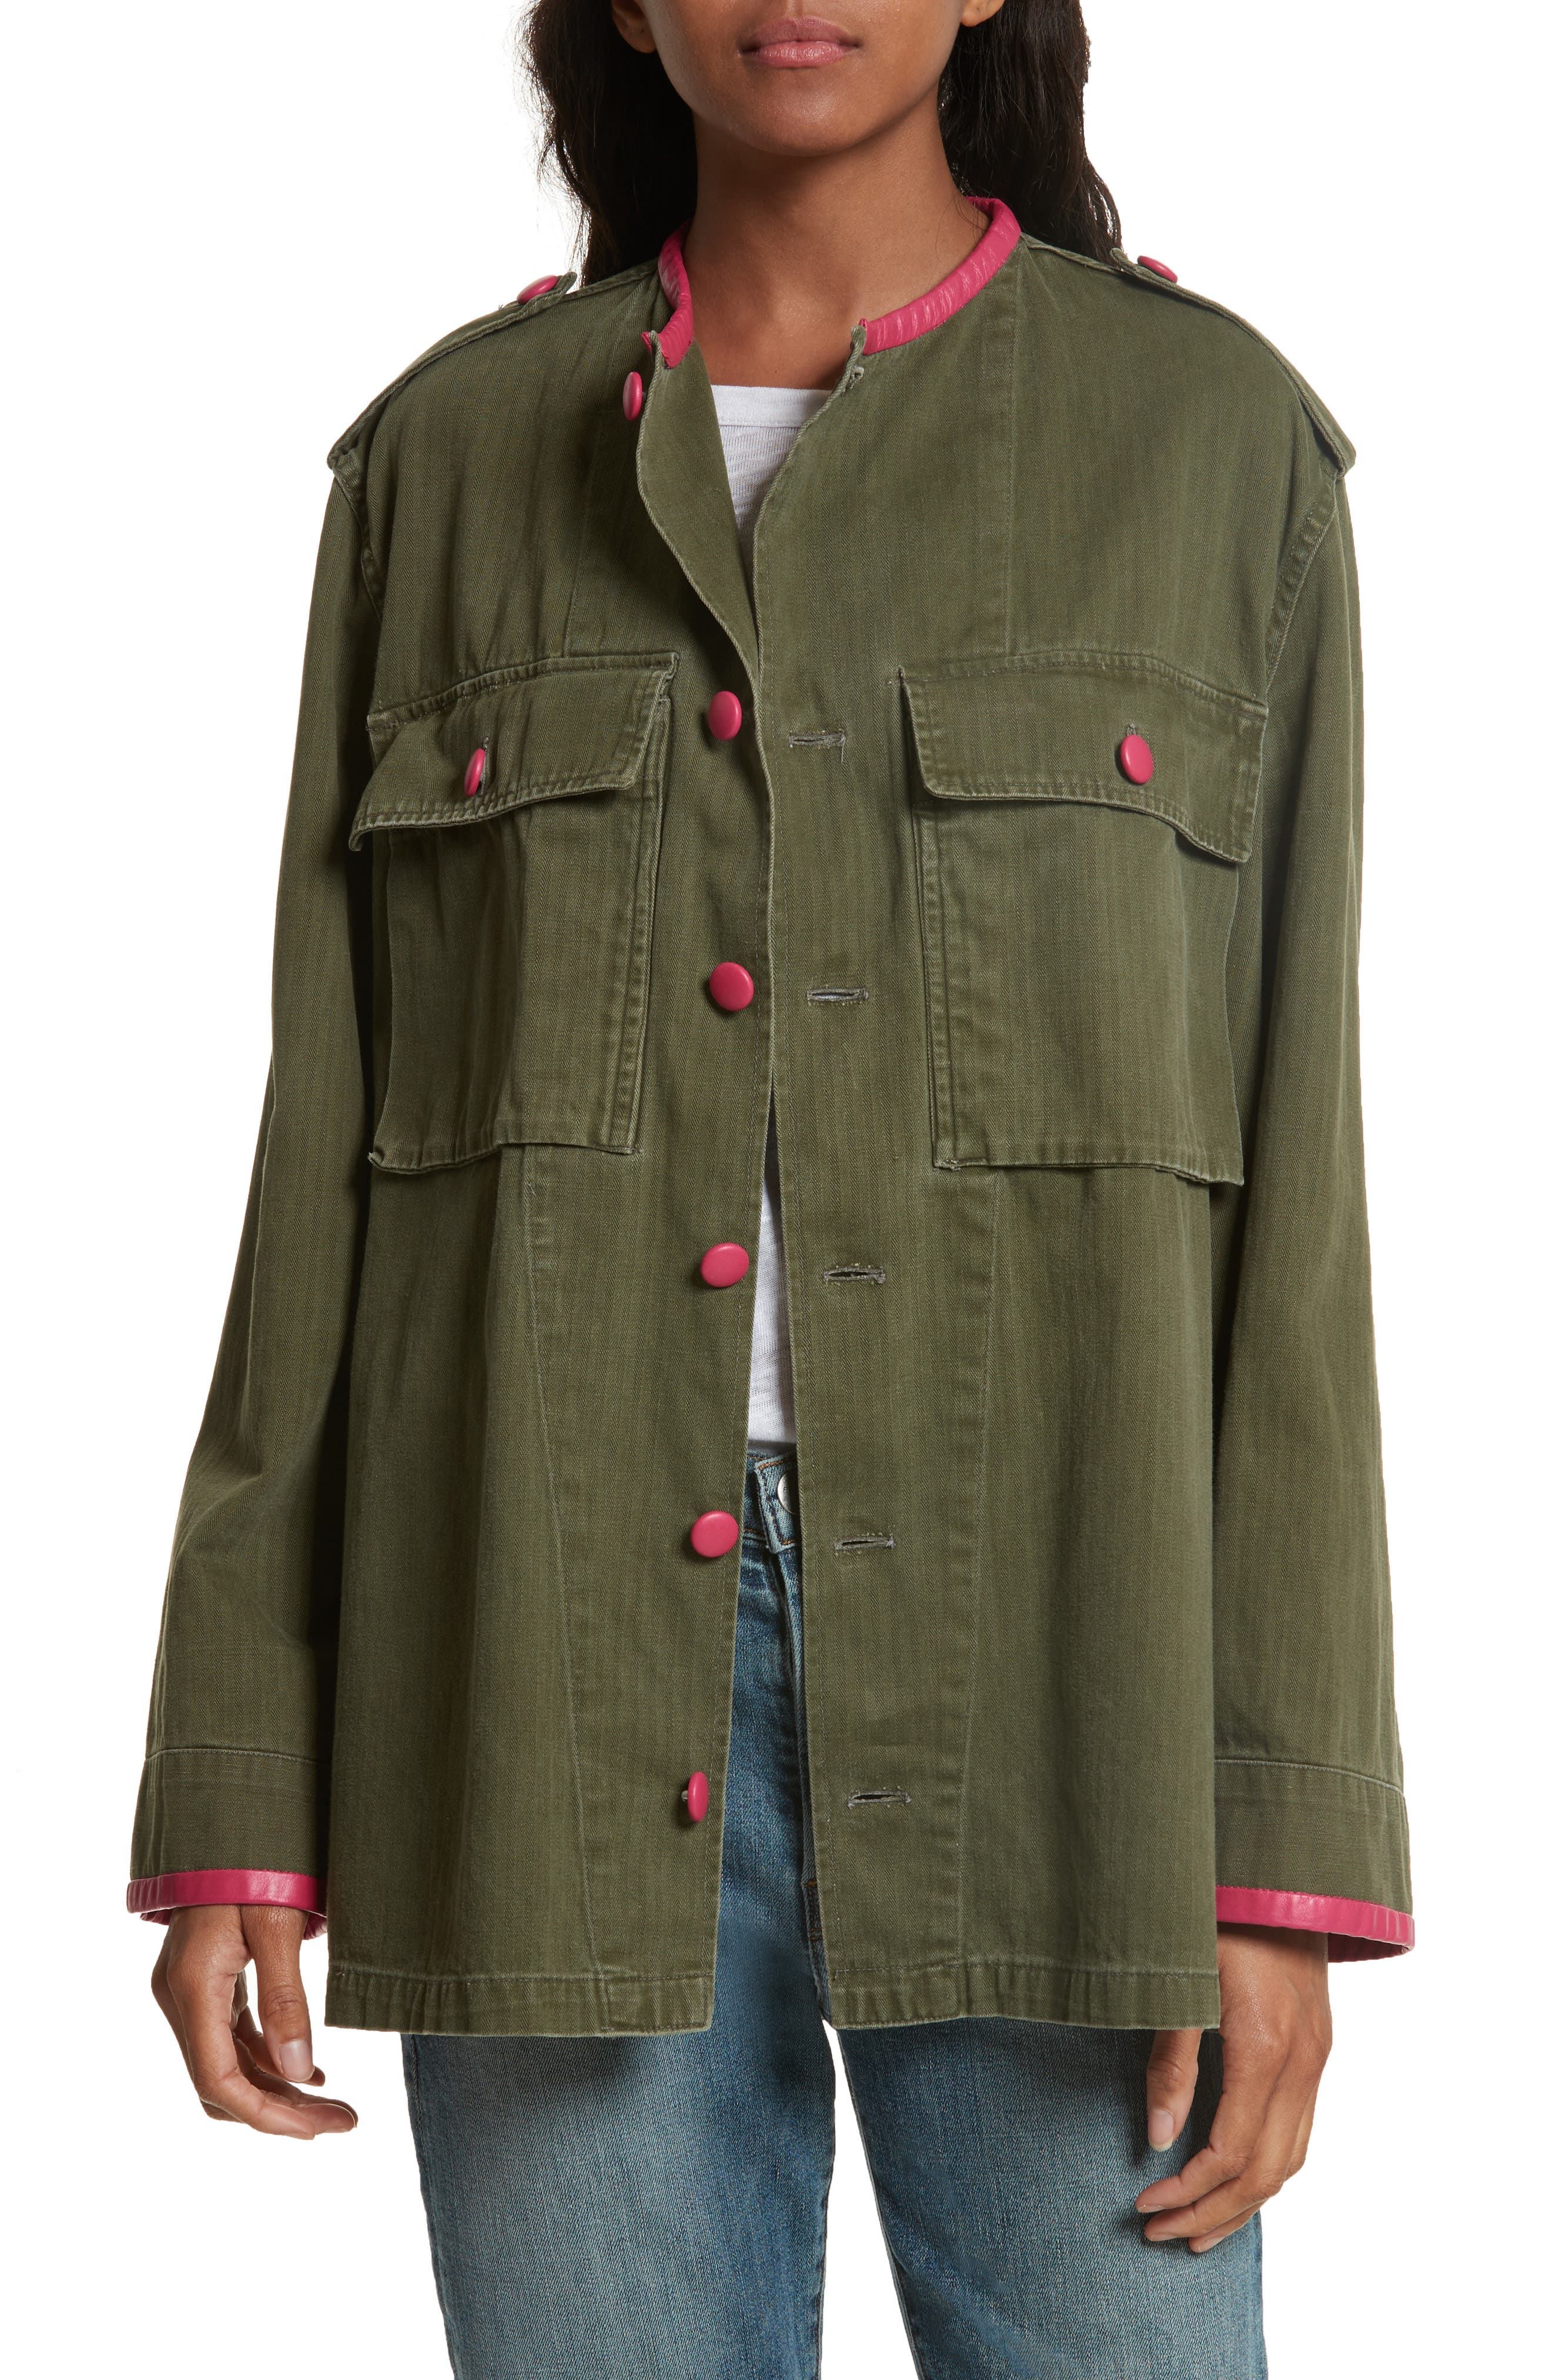 Harvey Faircloth Leather Trim Vintage Army Jacket